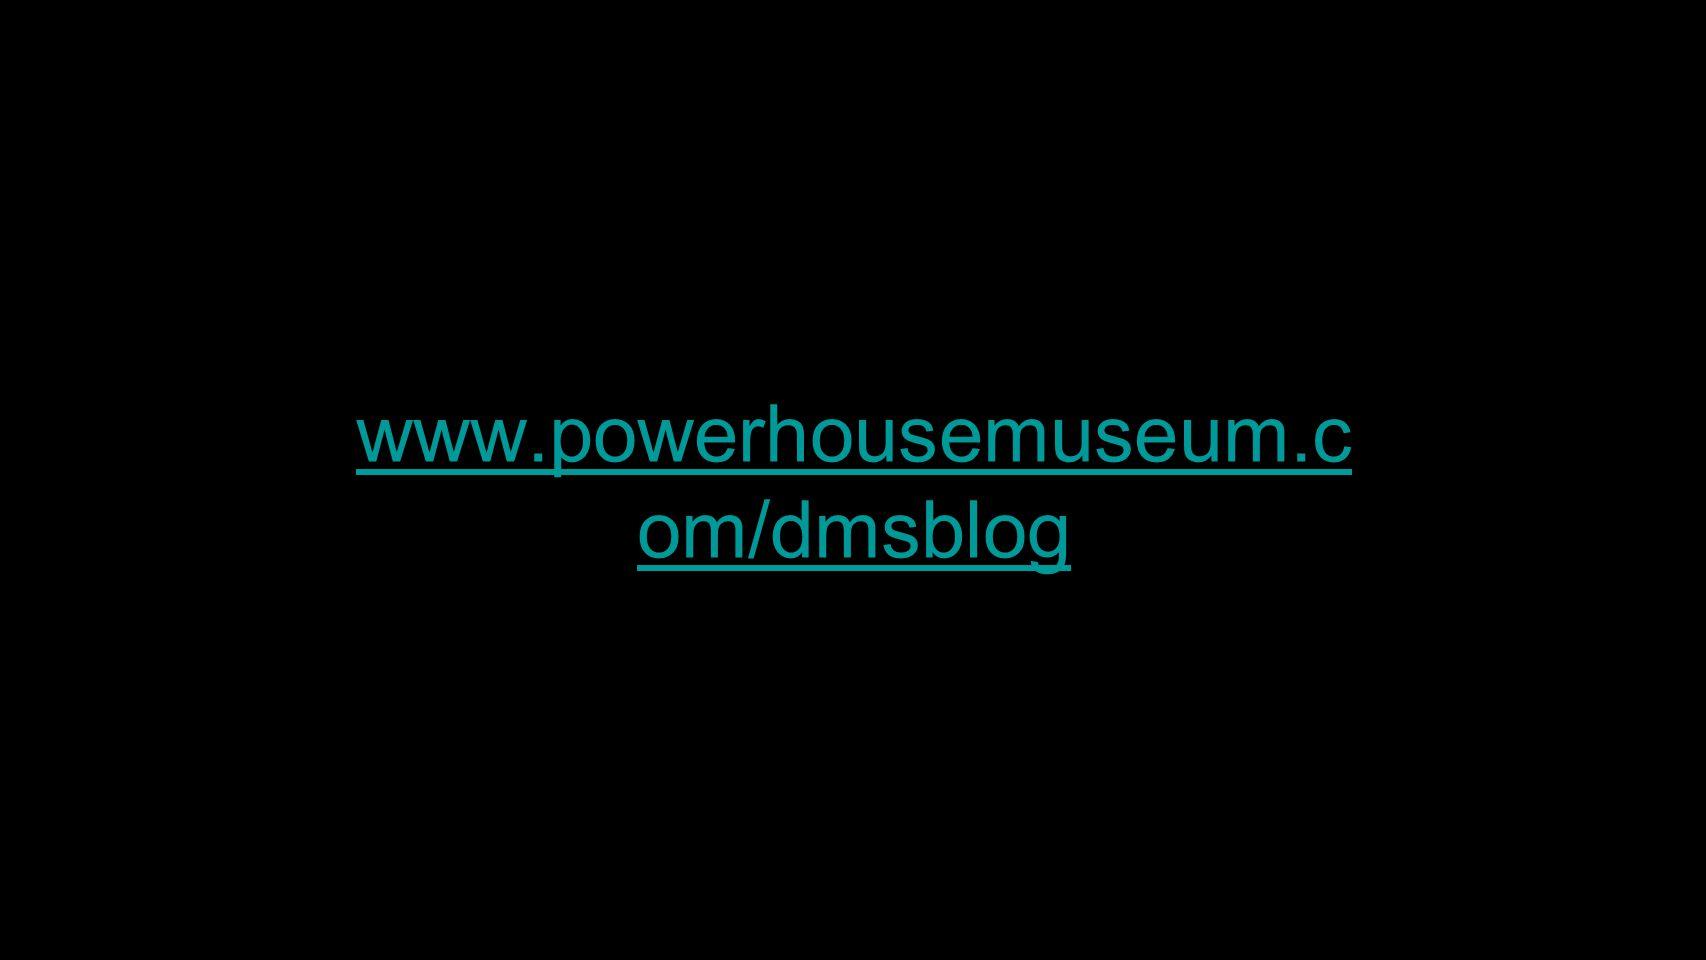 www.powerhousemuseum.c om/dmsblog